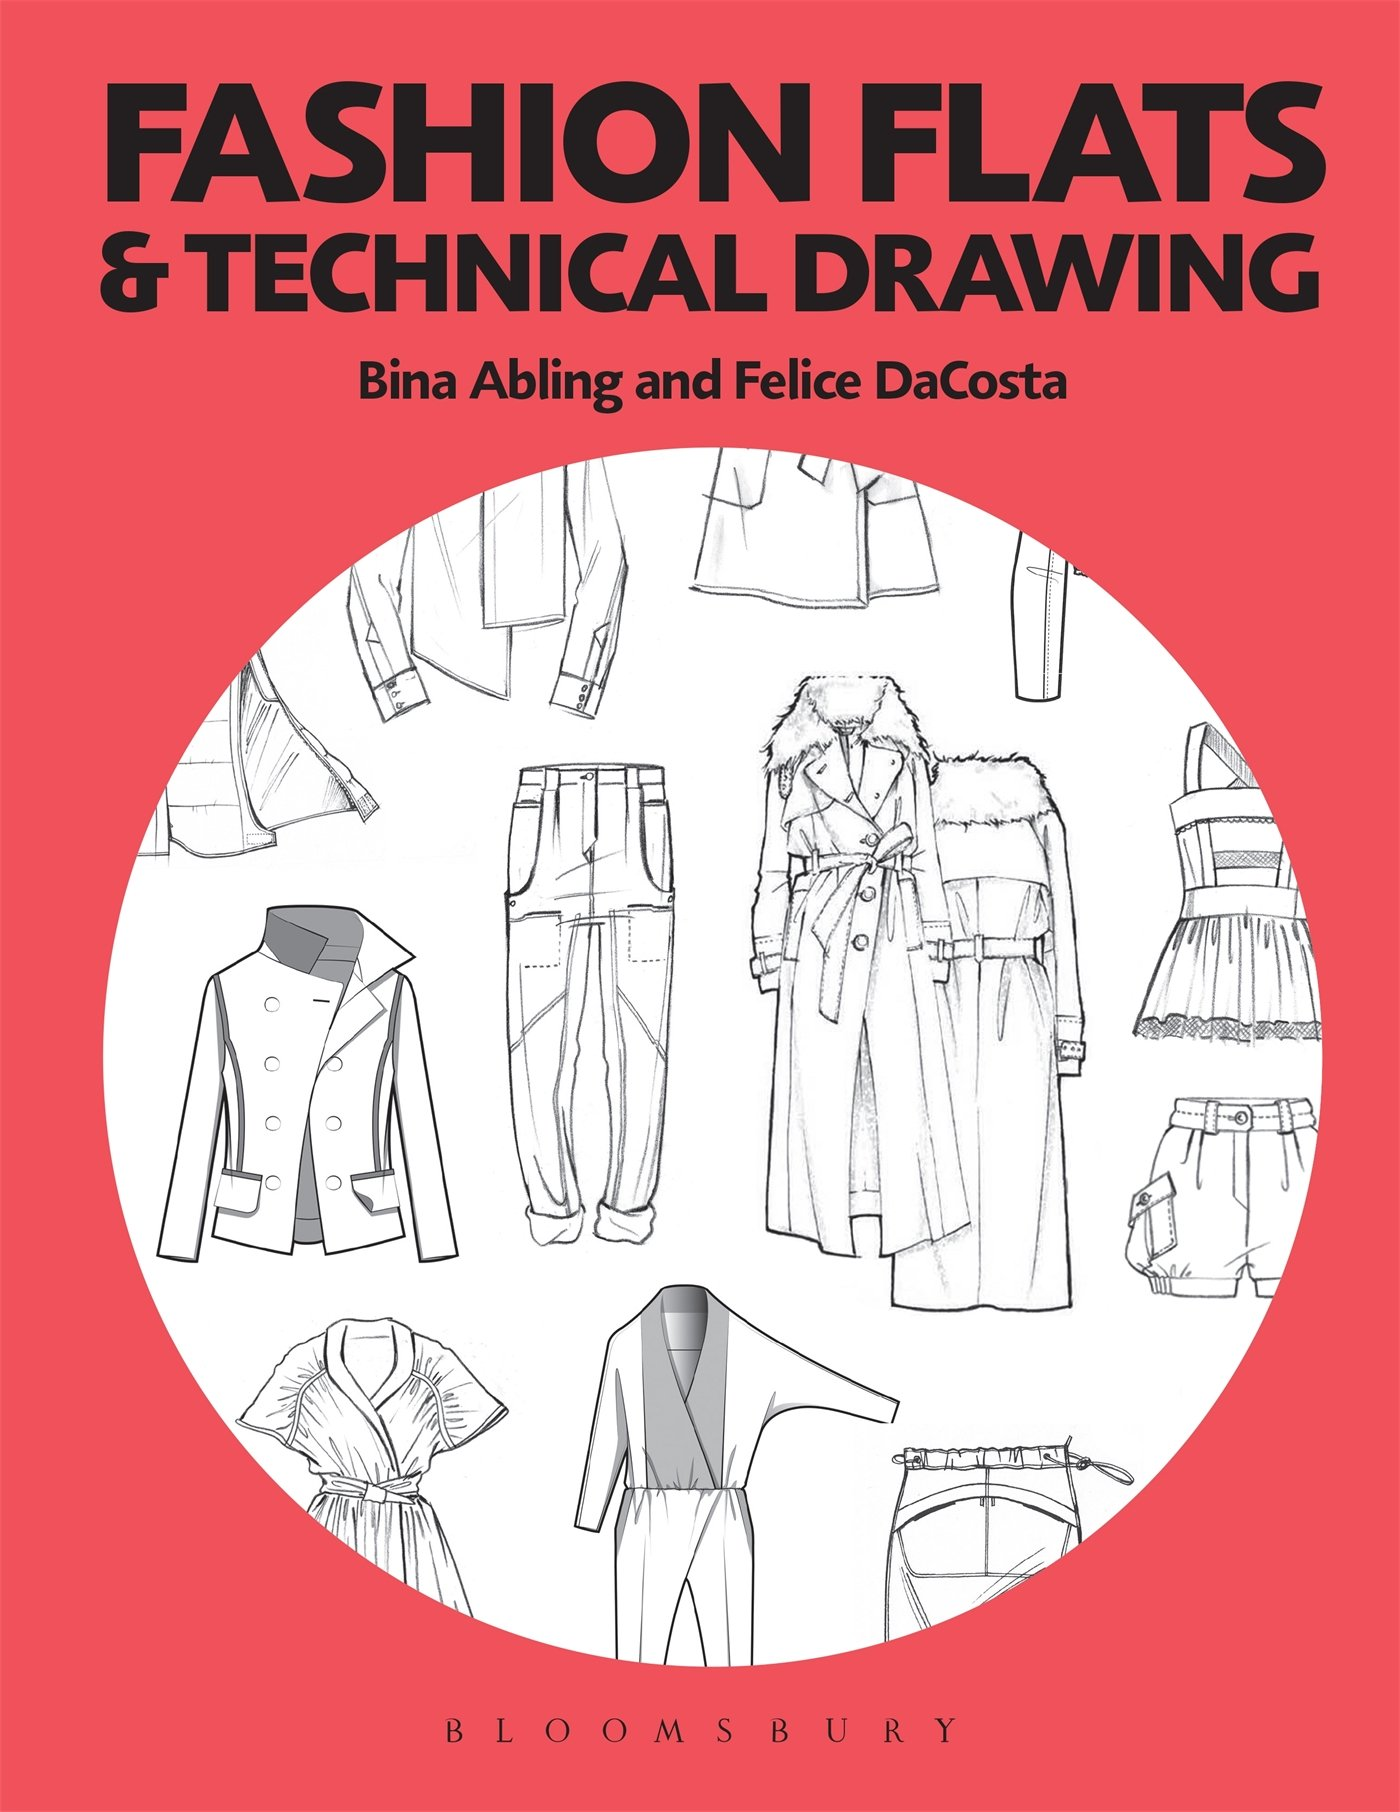 Technical Flats | Roman fashion, Technical drawing, Flat